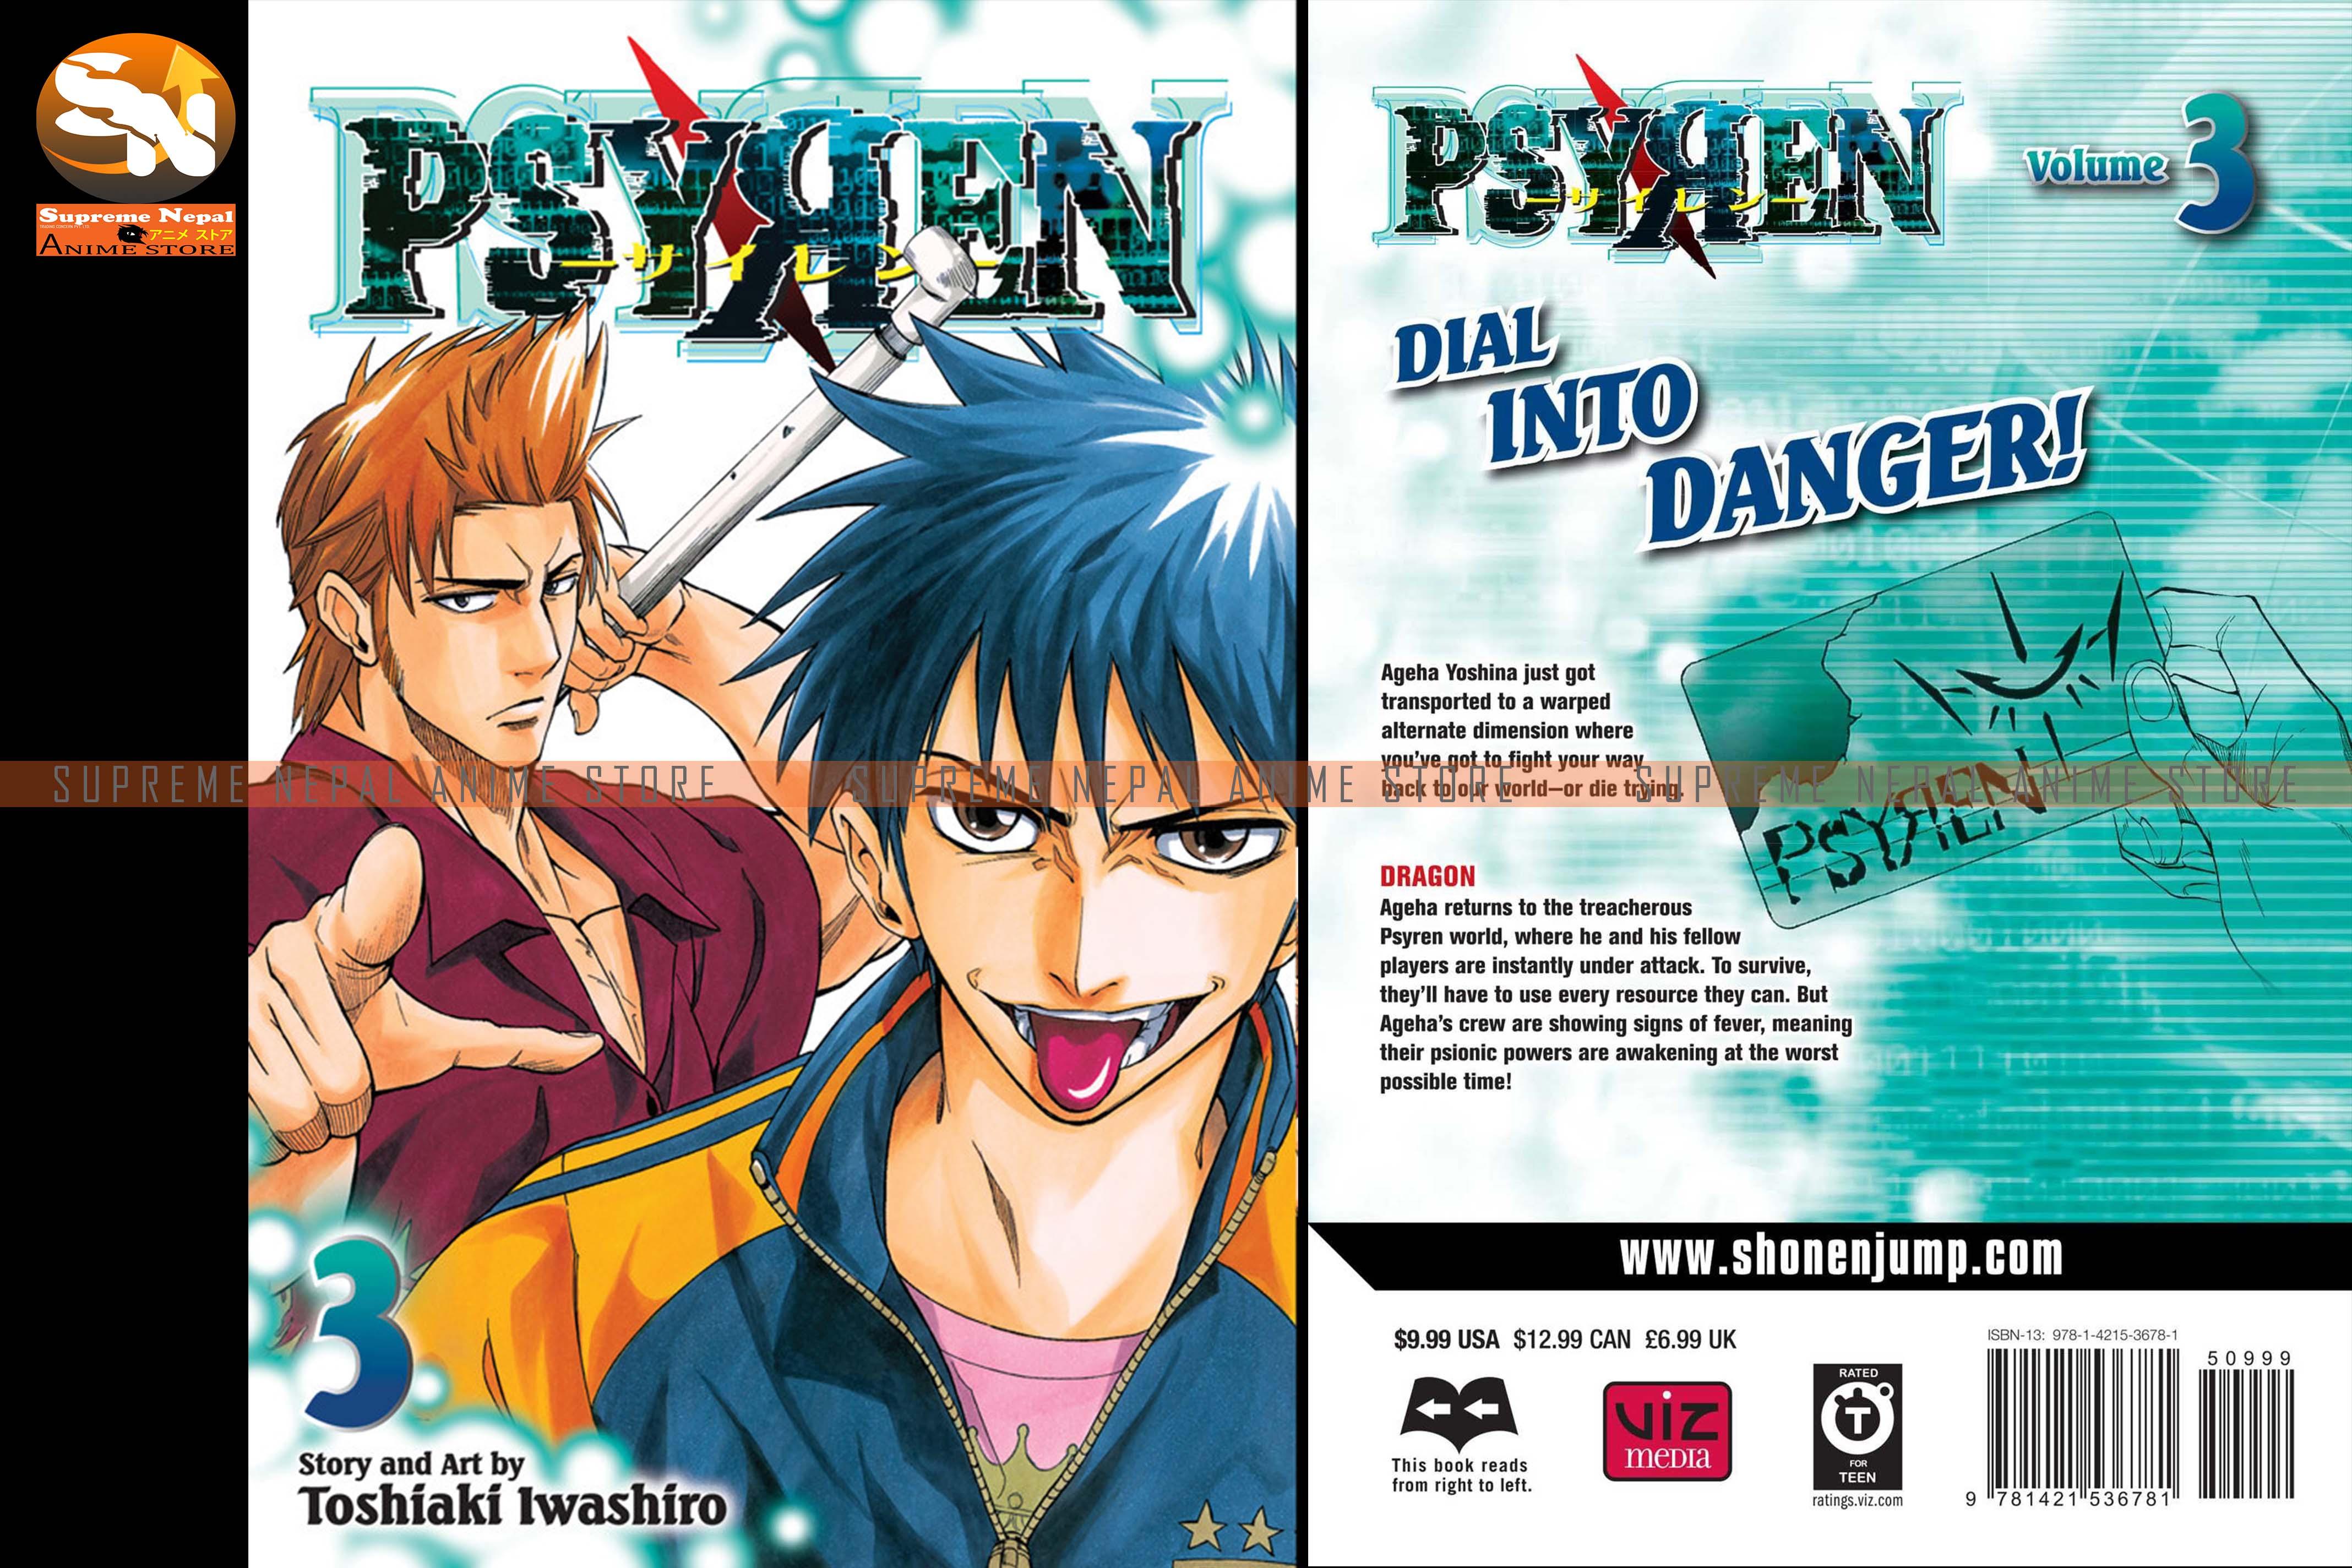 Psyren Manga Vol 3 Anime Store